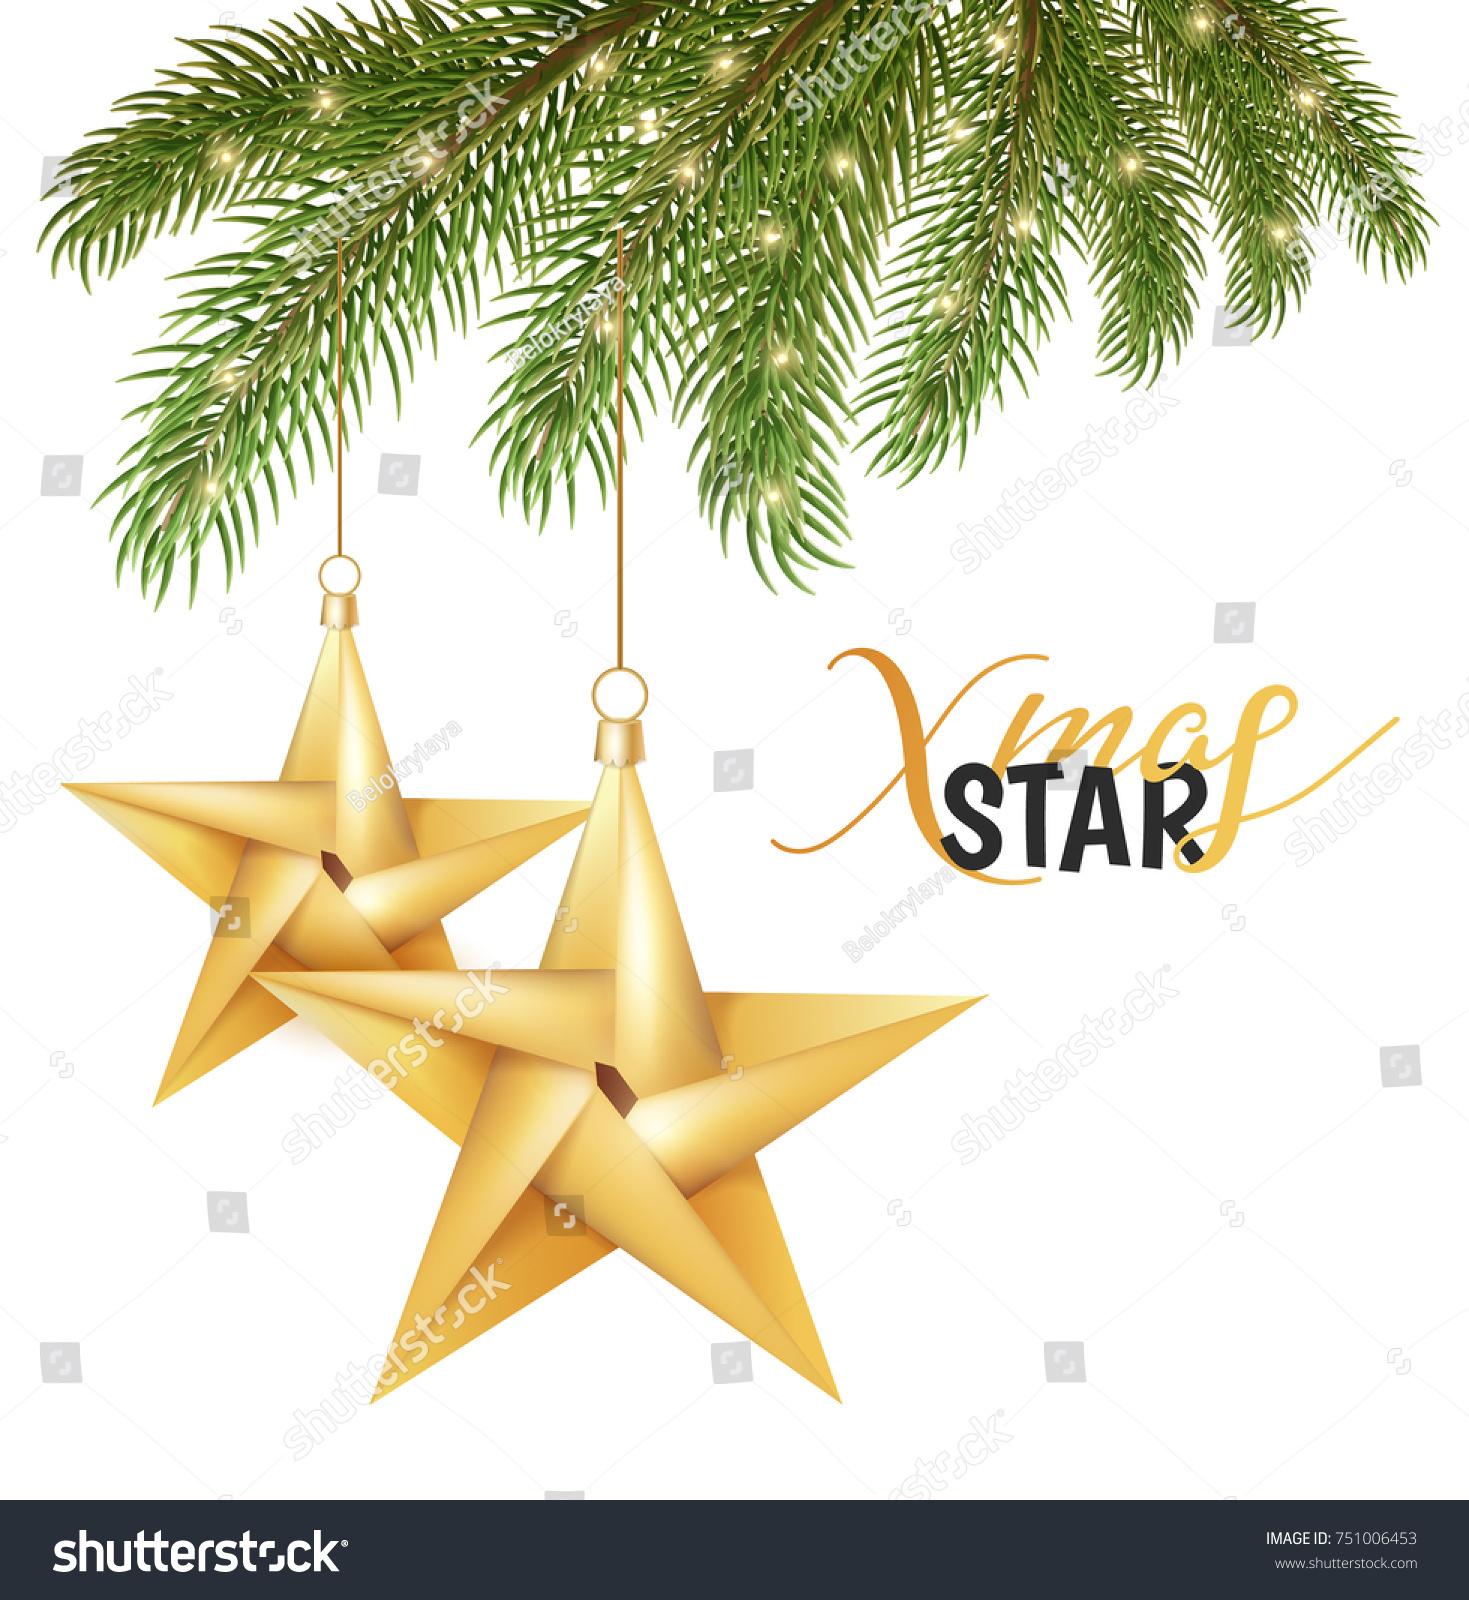 Christmas Tree Gold Star Toys Stock Vector Shutterstock